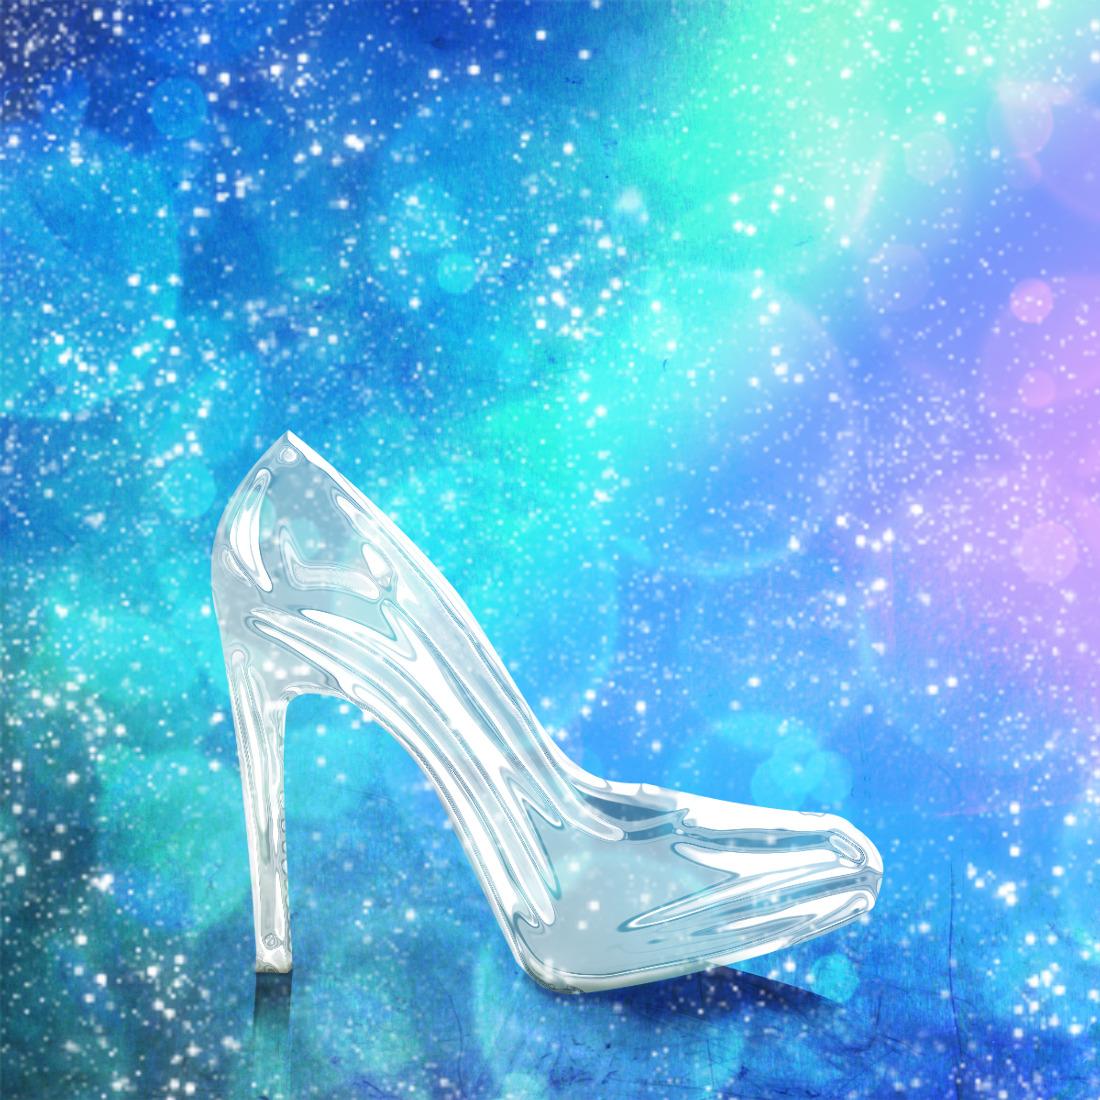 Завода, картинки туфельки из сказки золушка